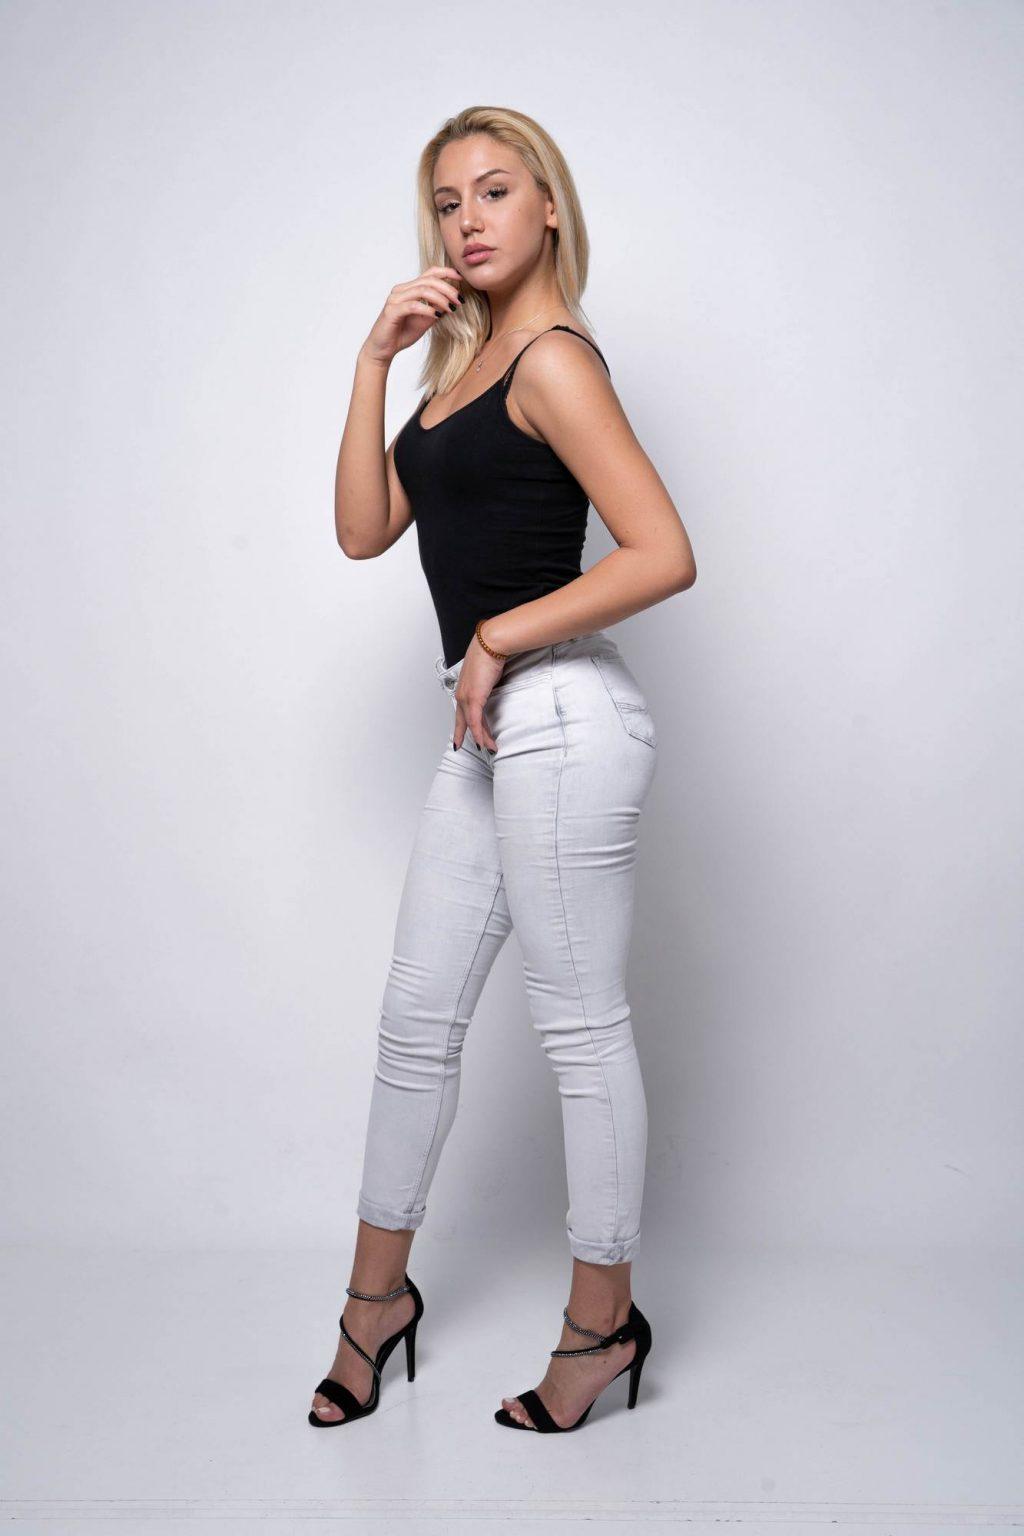 005 - Anastasija